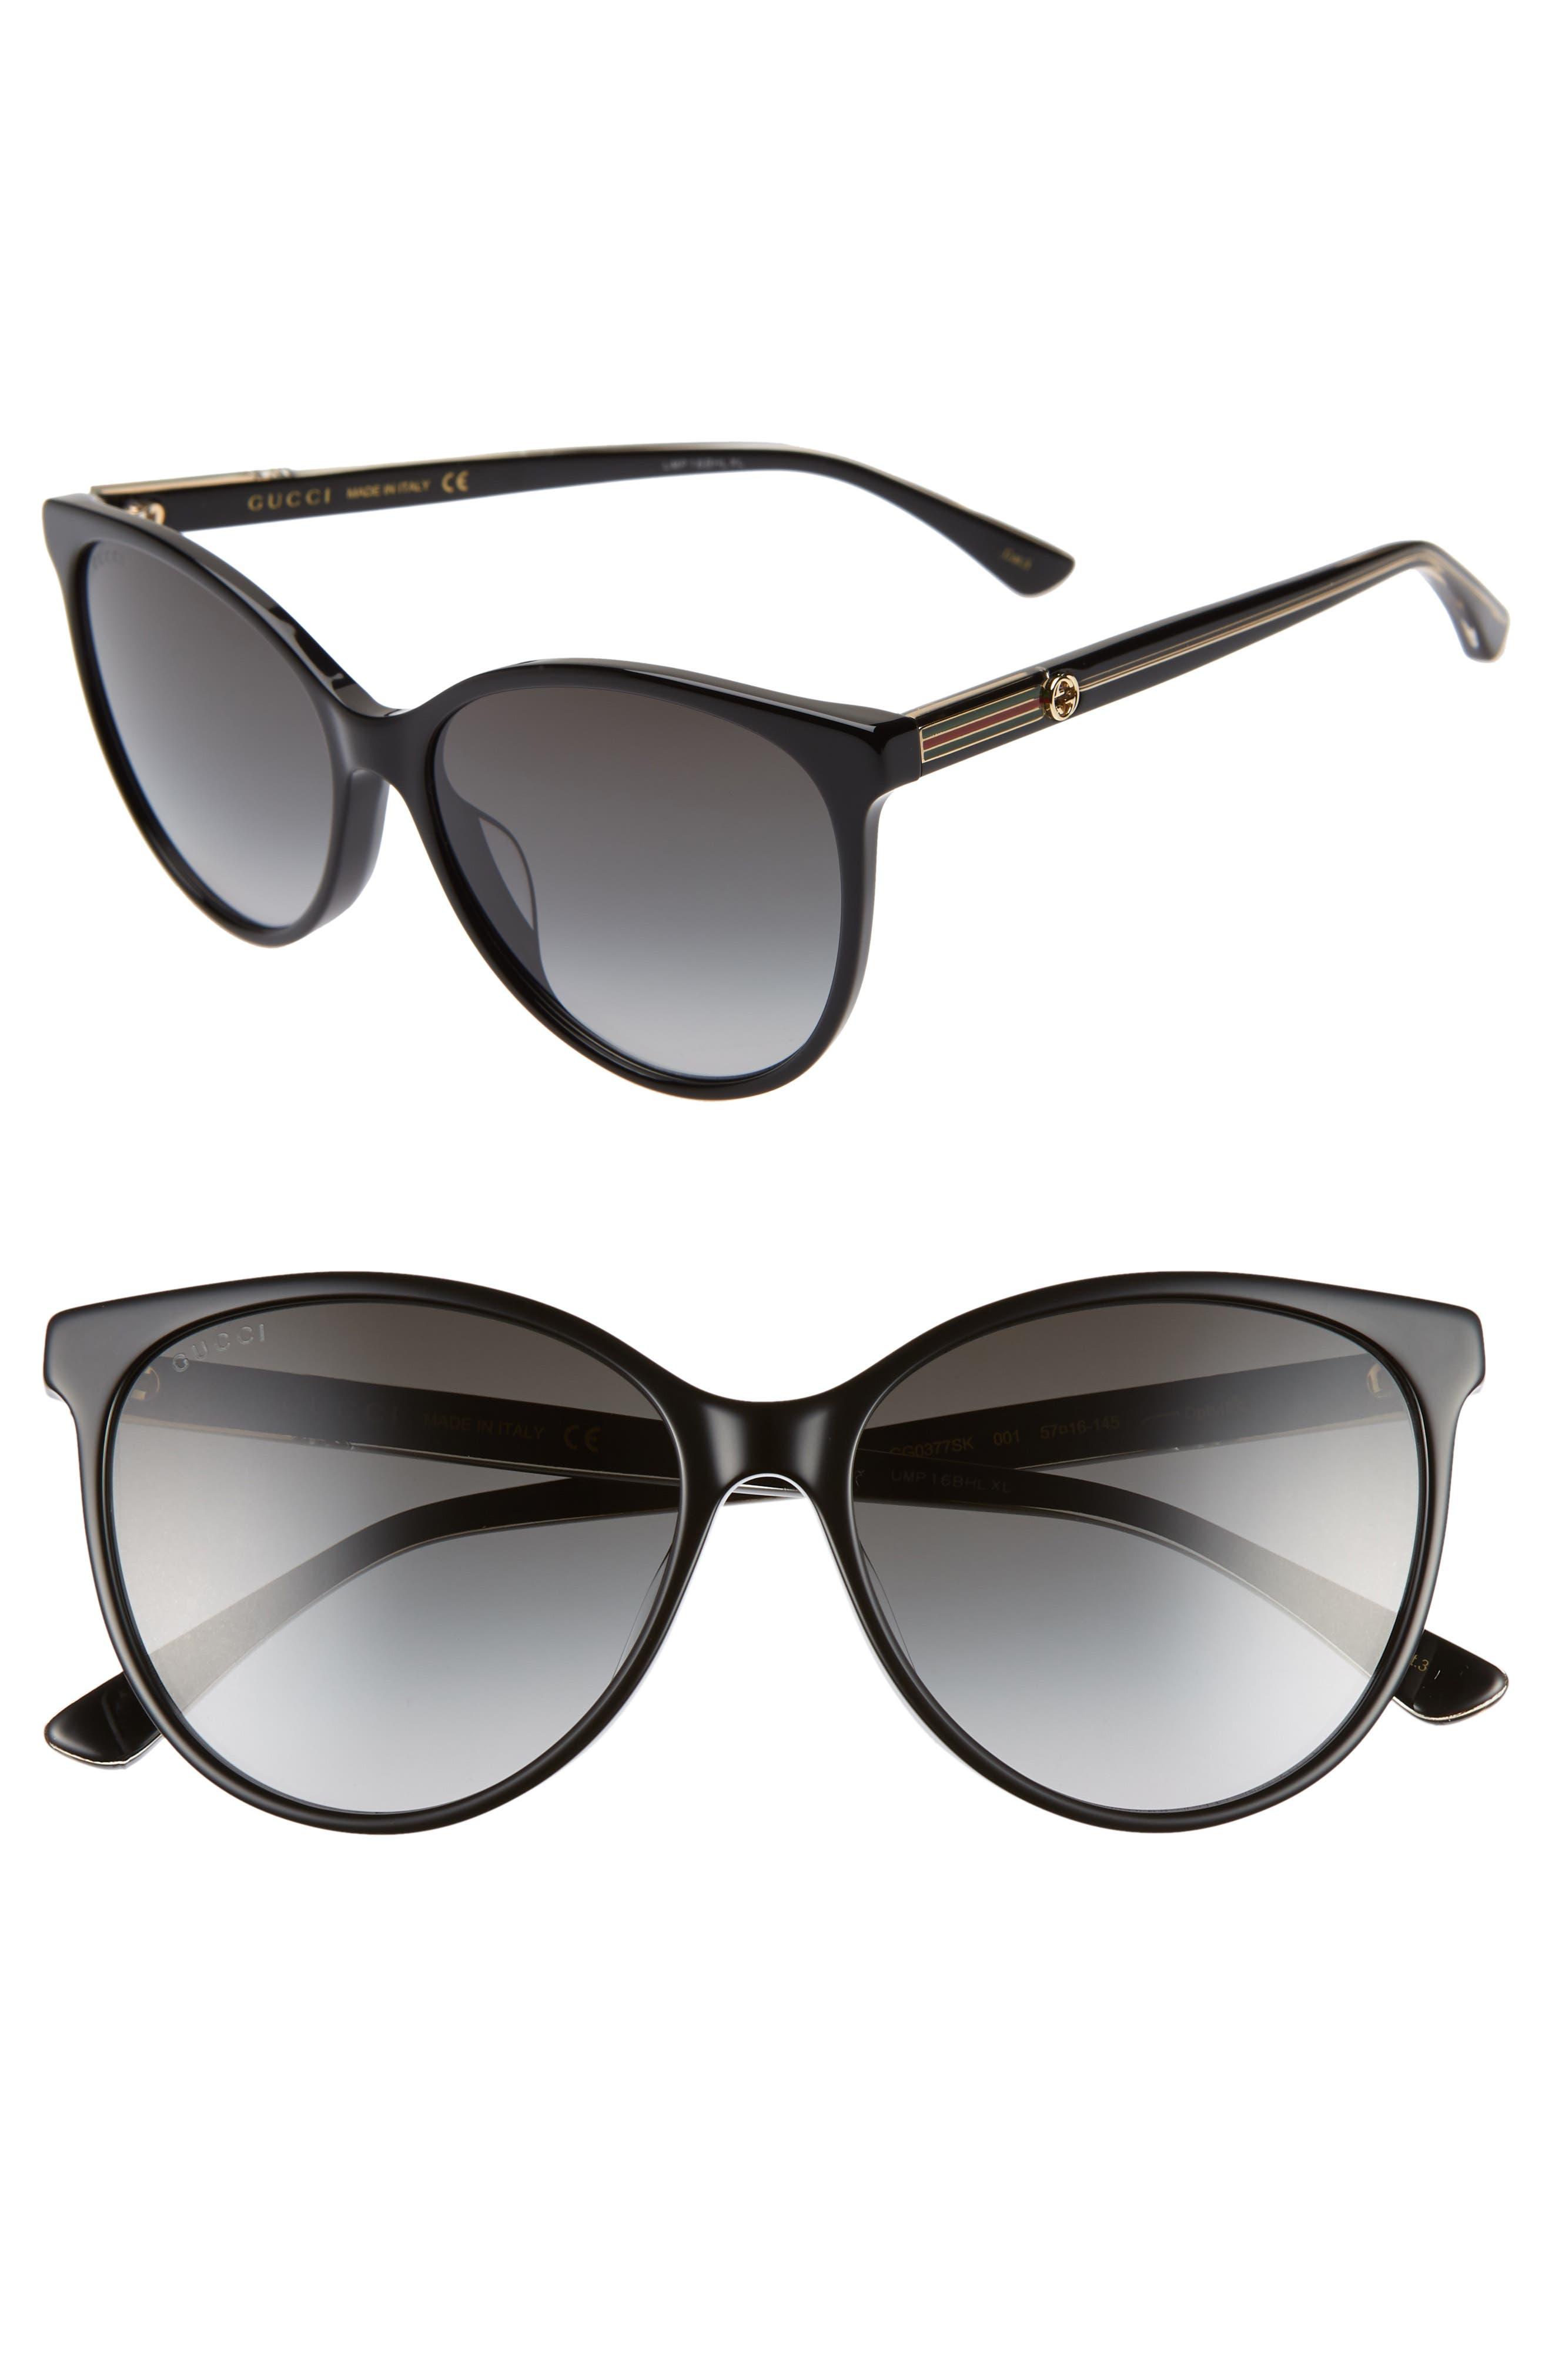 GUCCI,                             57mm Cat Eye Sunglasses,                             Main thumbnail 1, color,                             BLACK/ CRYSTAL/ GREY GRADIENT